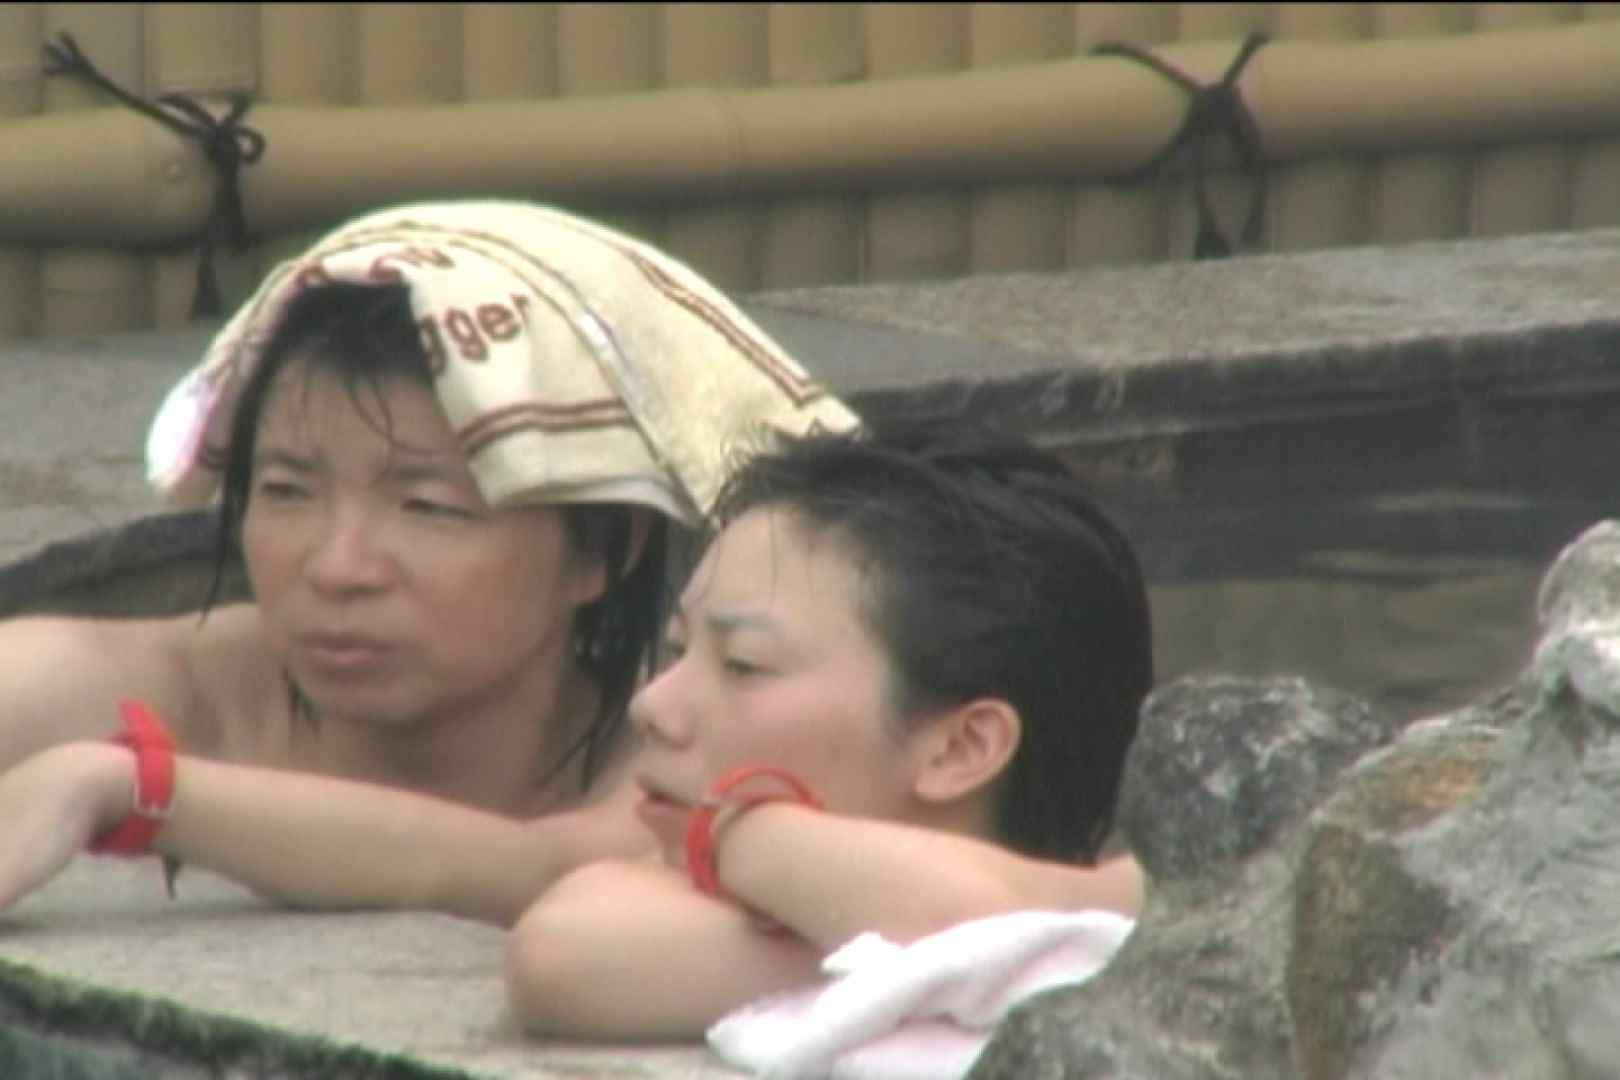 Aquaな露天風呂Vol.122 OLのプライベート | 盗撮特撮  10pic 4